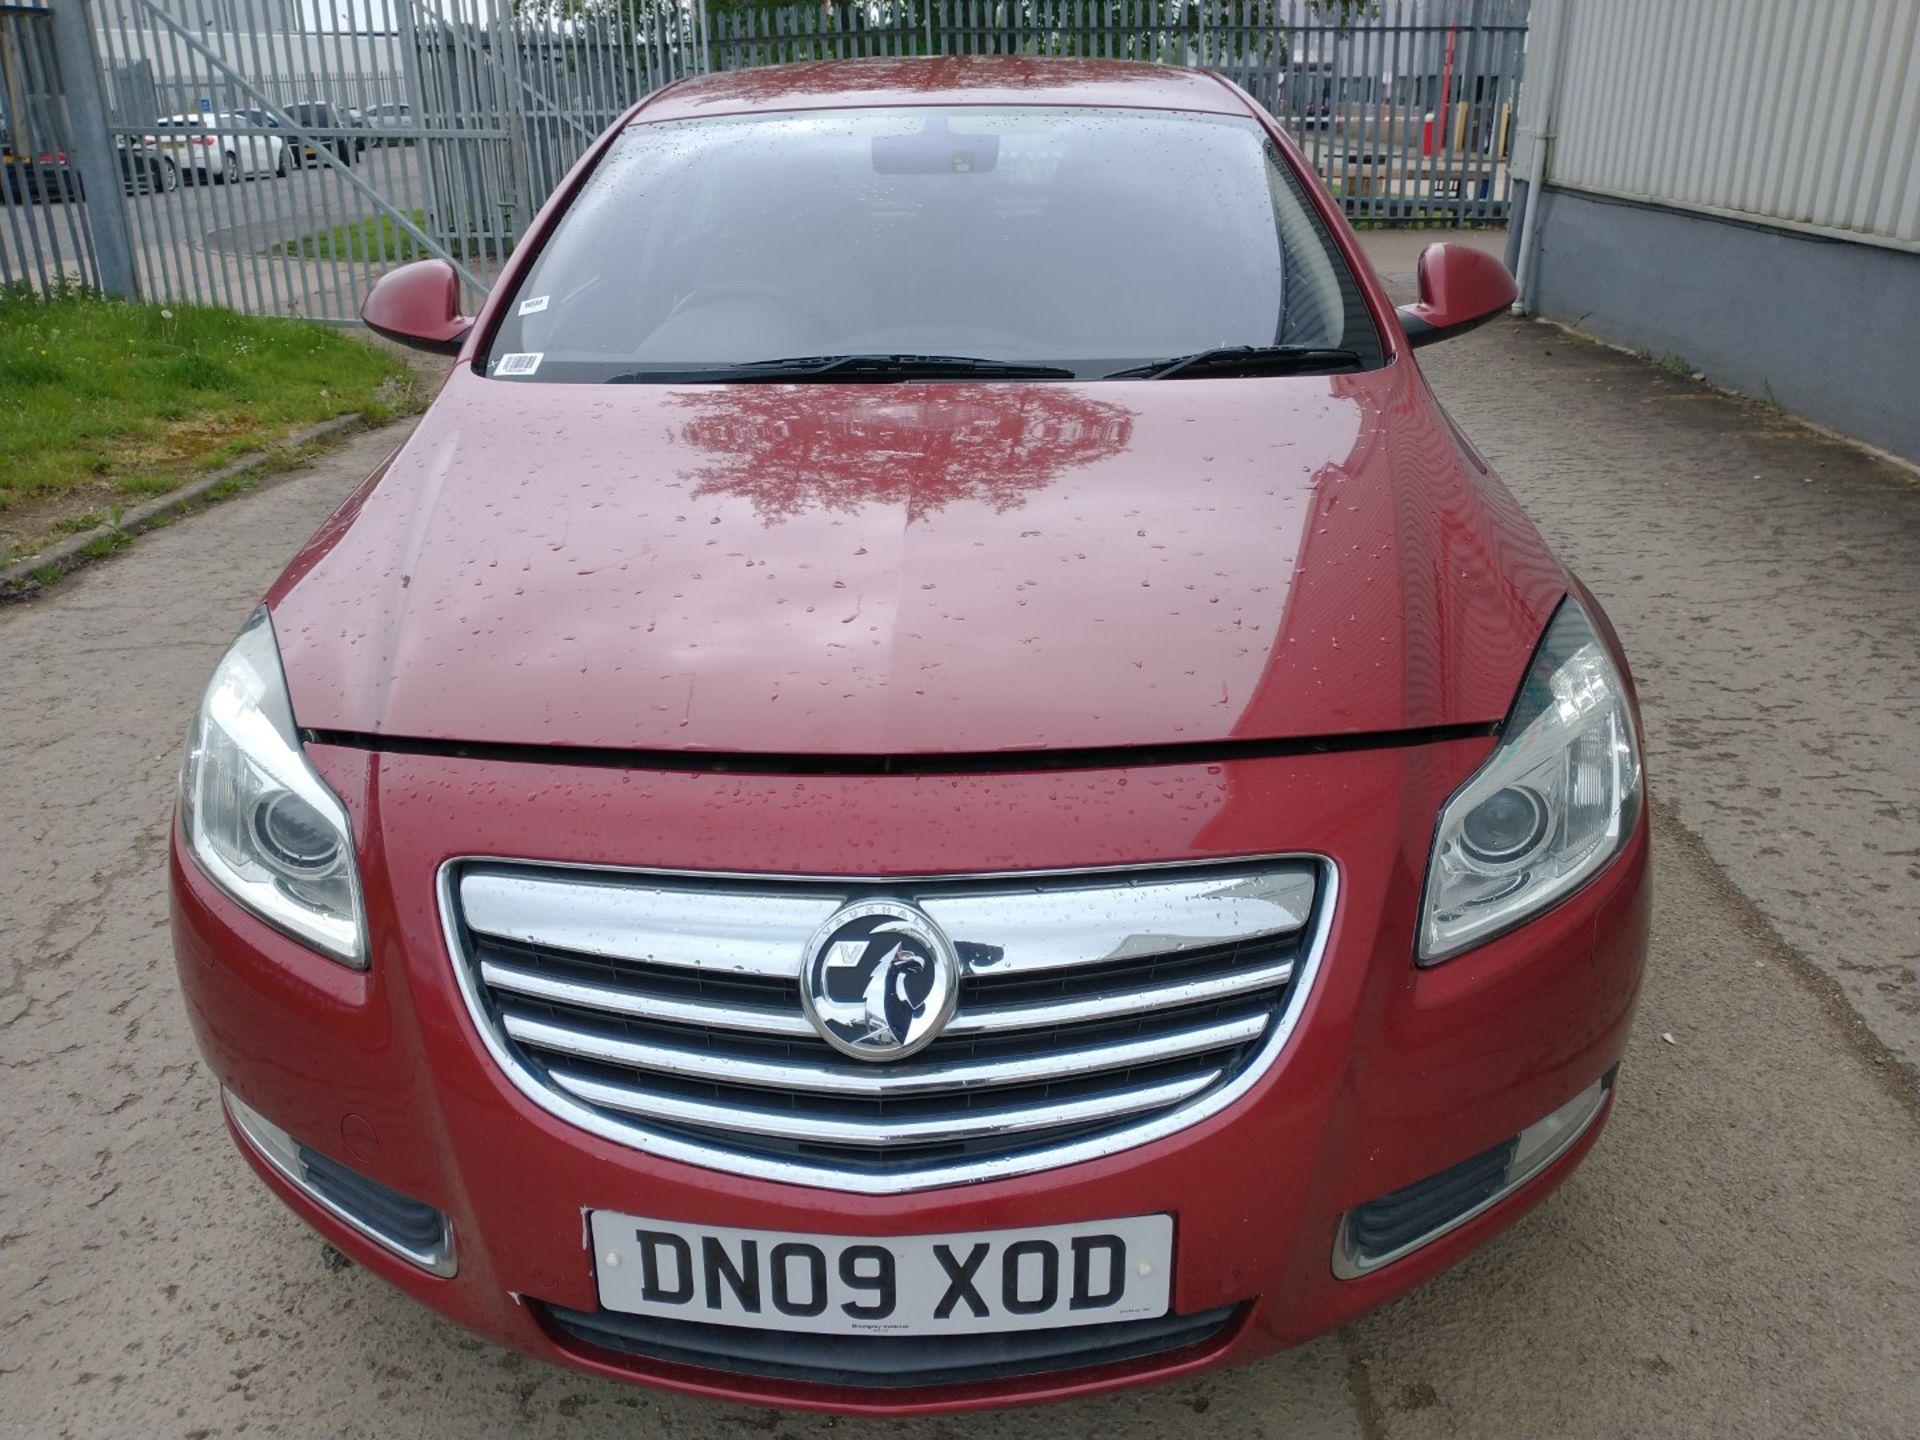 2009 Vauxhall Insignia Elite Nav CDTI 5dr 2.0 Diesel - CL505 - NO VAT ON THE HAMMER - Location: Corb - Image 3 of 22